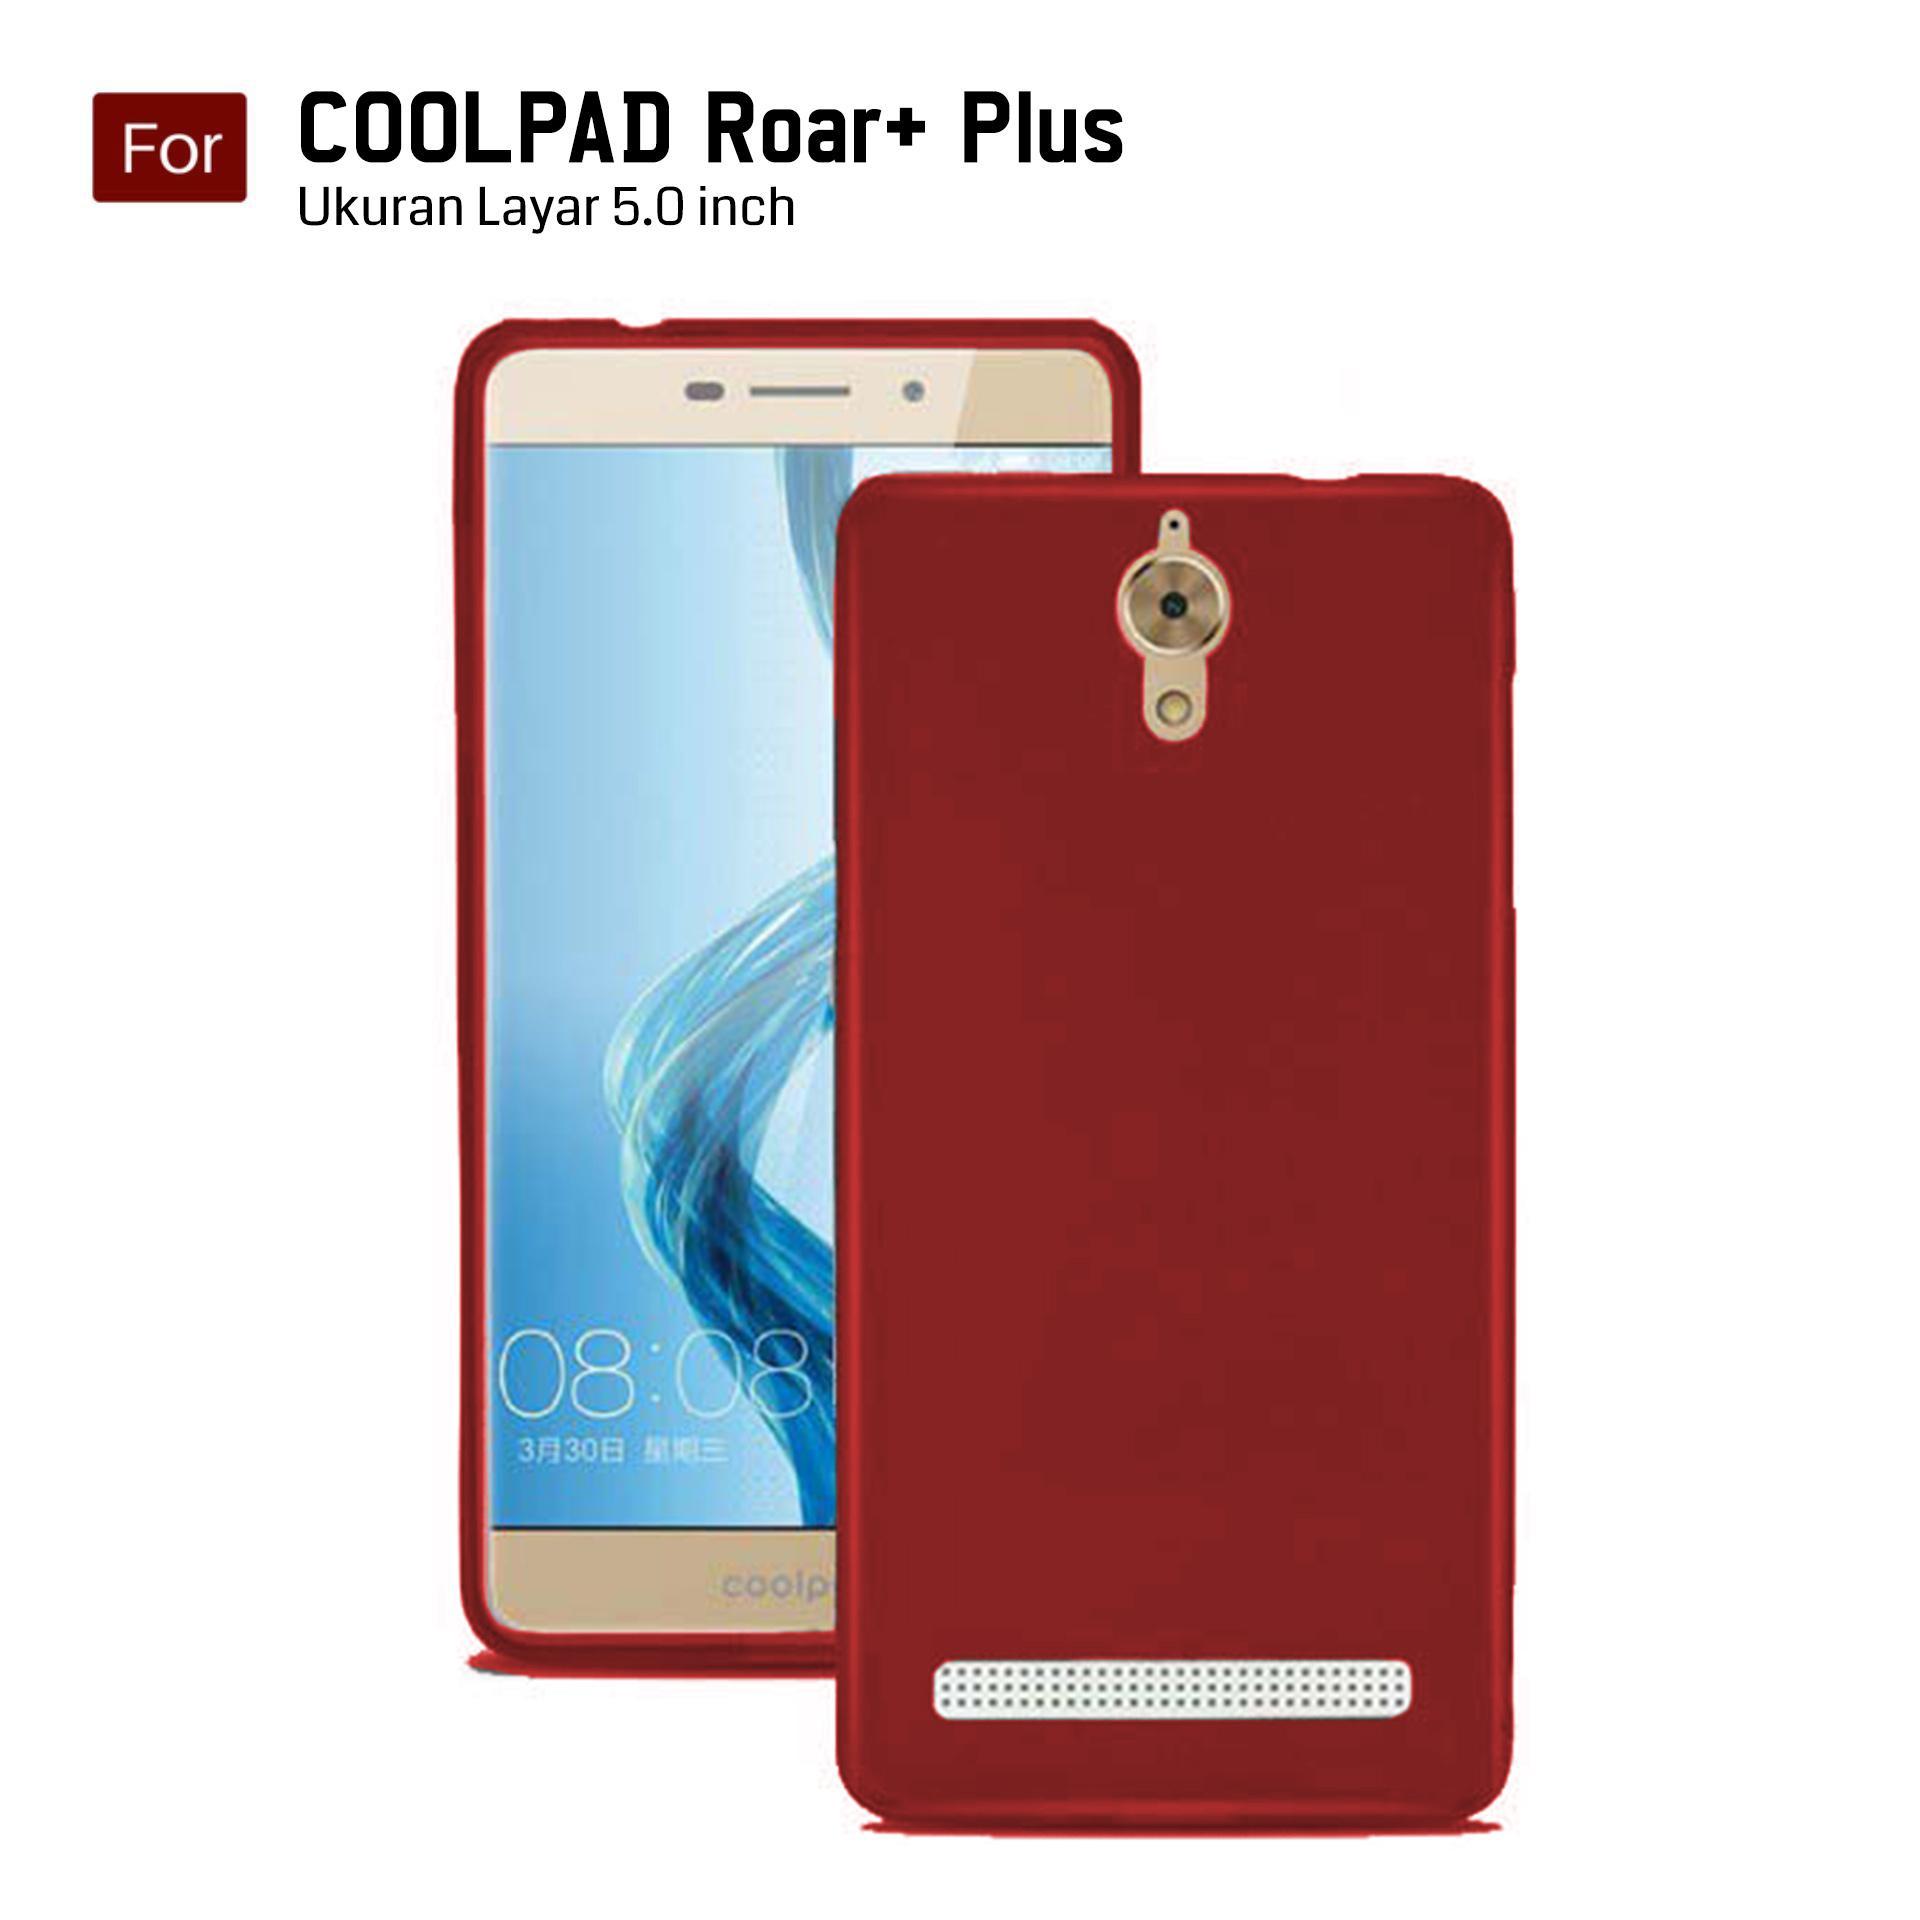 Case For Coolpad Max Lite R108 Abu Gratis Tempered Glass Ultra Tpu Slim Matte Black Babyskin Asus Zb602kl Zb601kl Zenfone Pro M1 2018 New Hot